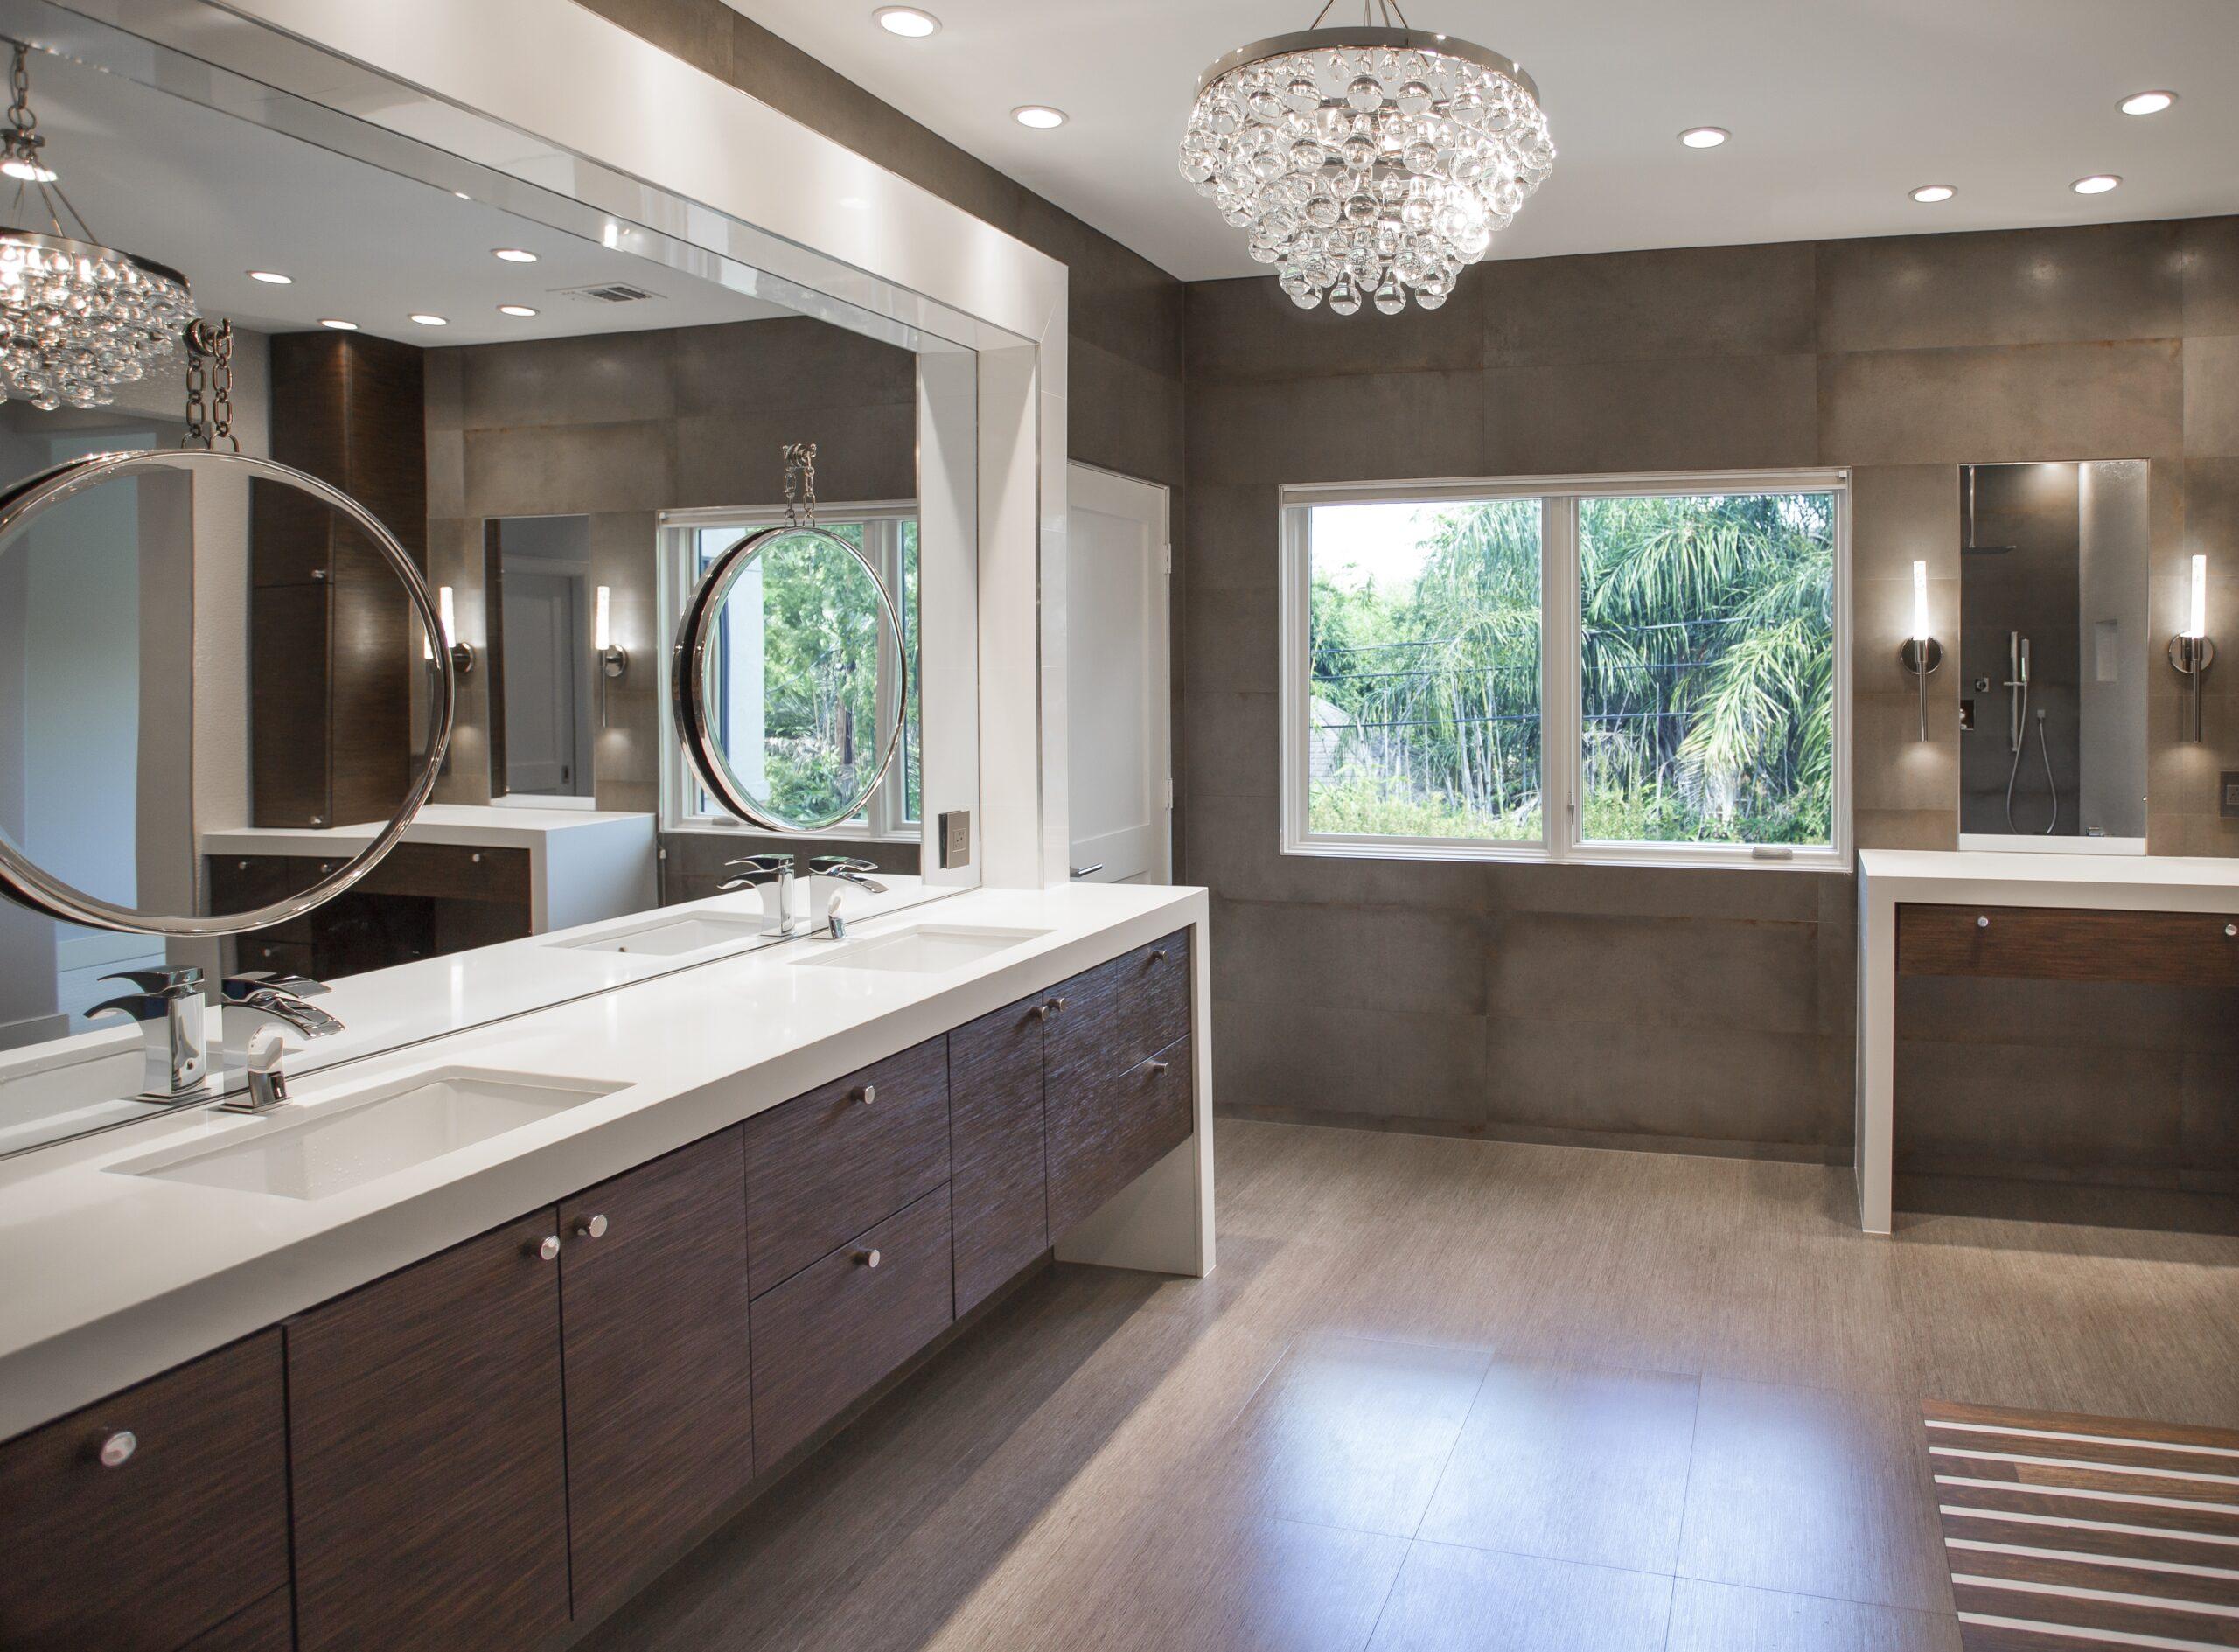 West University Master Bathroom   Houston, Texas   2015